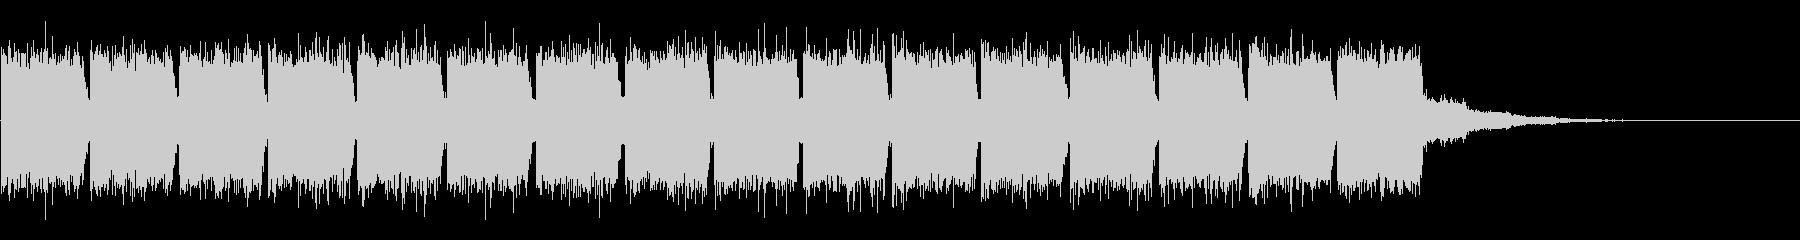 KANT近未来映画アニメ的アラーム音2の未再生の波形